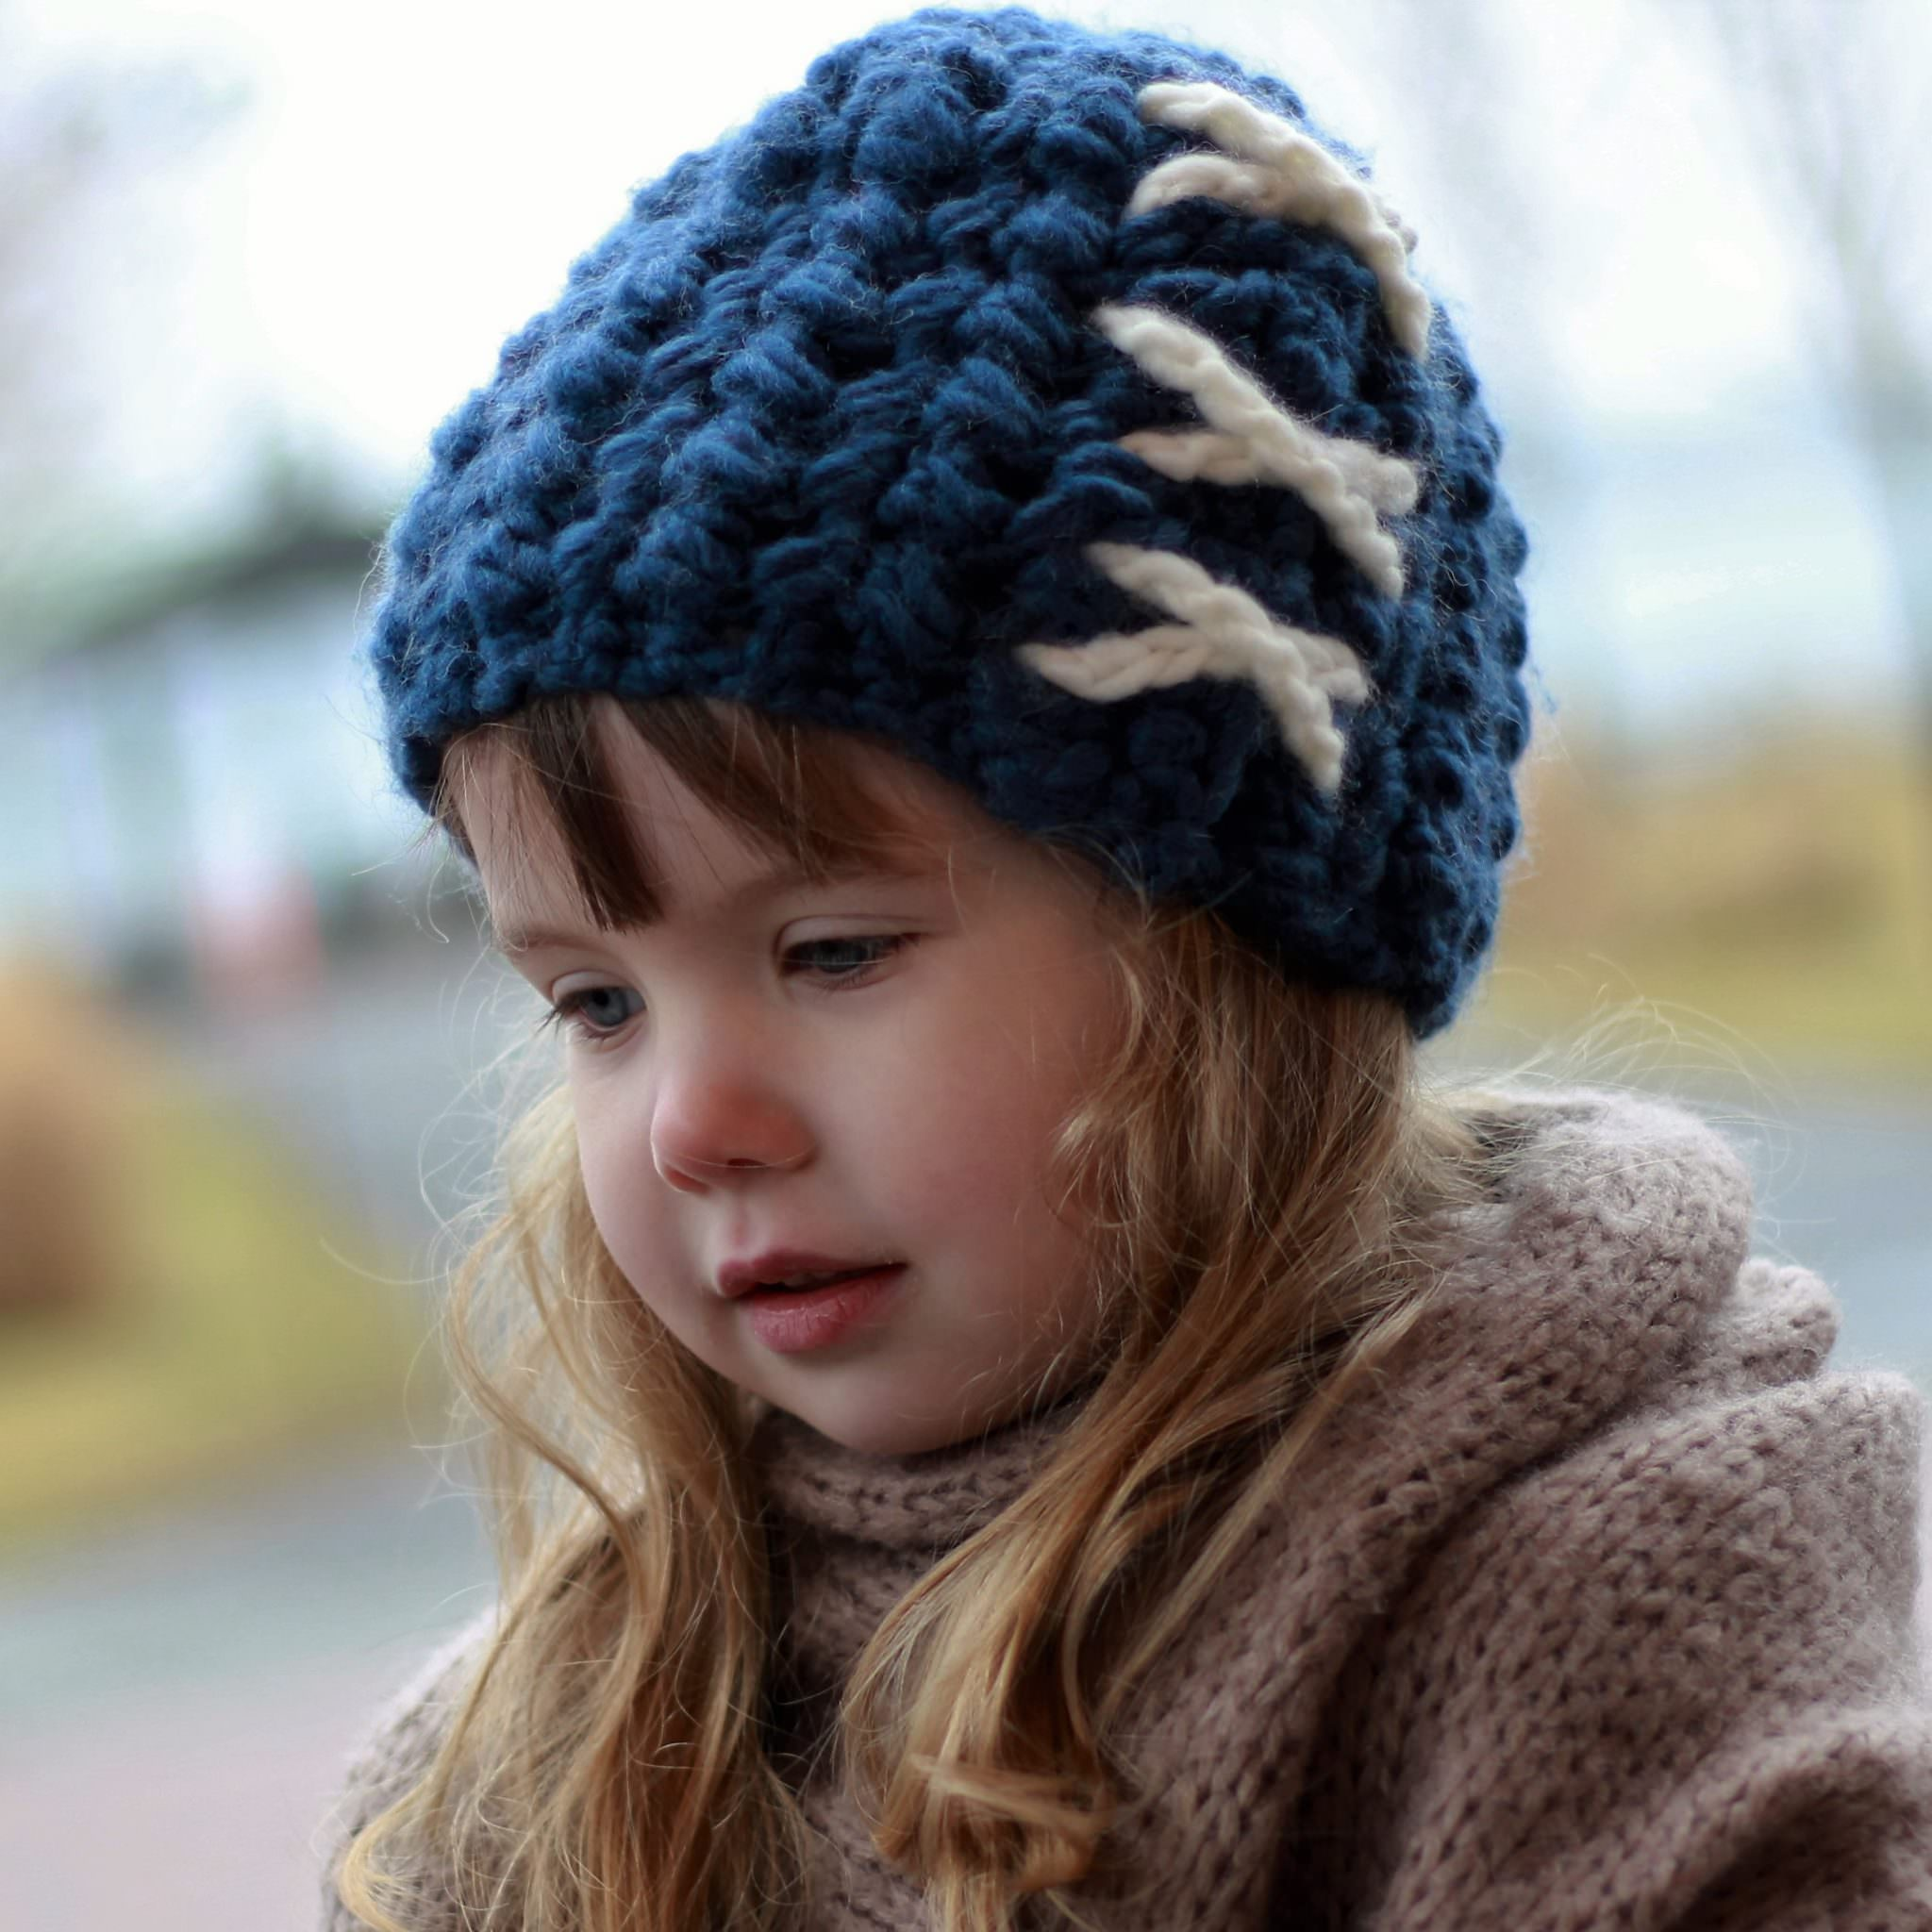 Diana Cloche Hat Crochet Pattern The Easy Design